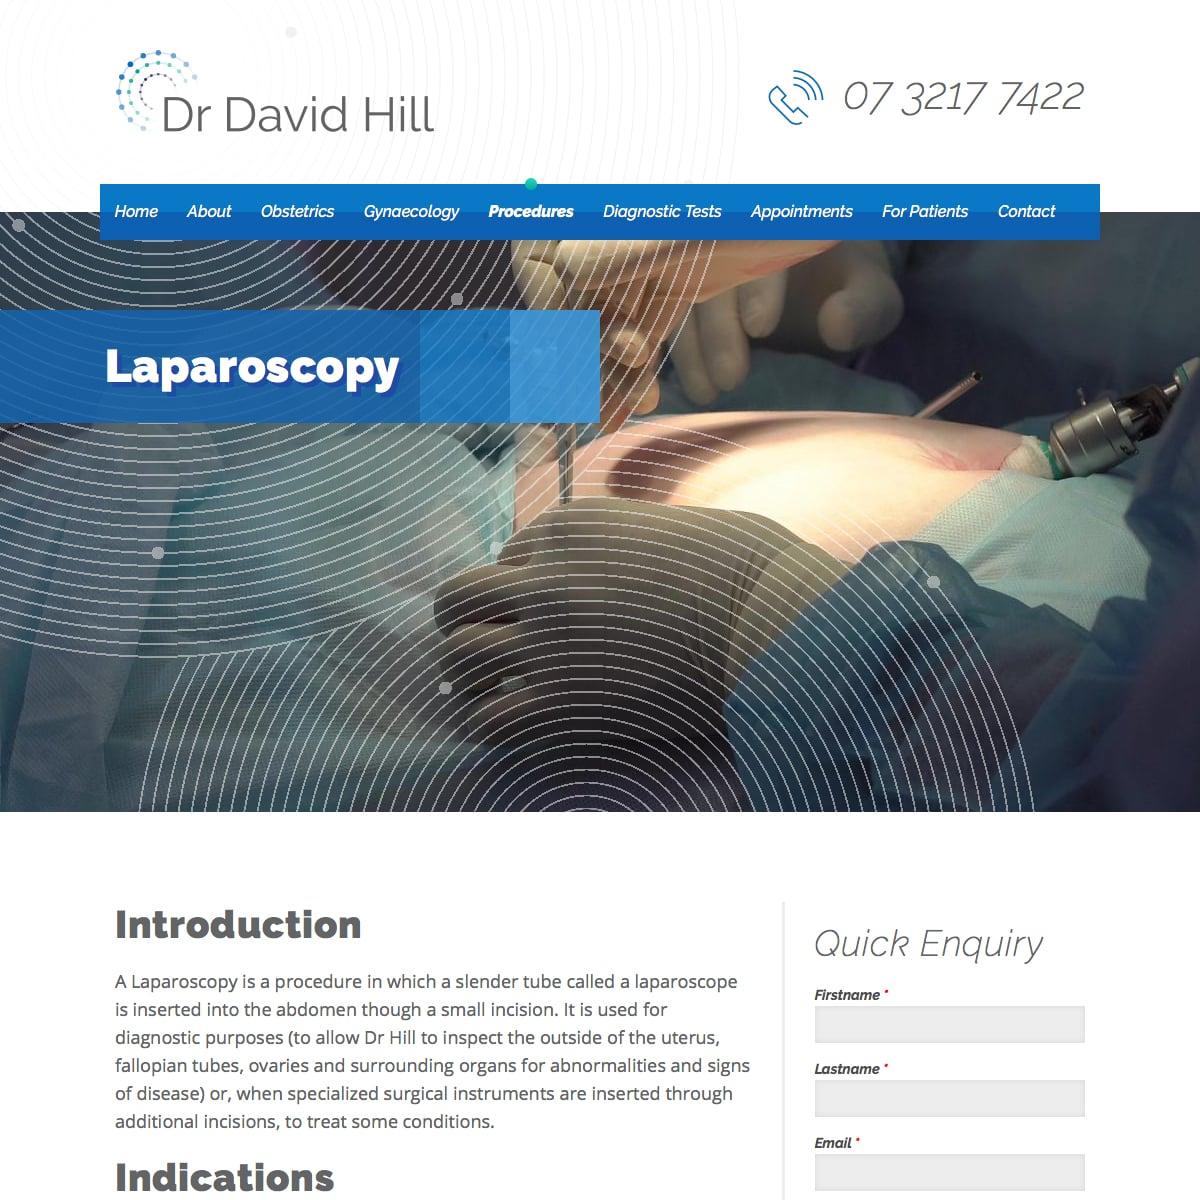 Dr David Hill - Laparoscopy